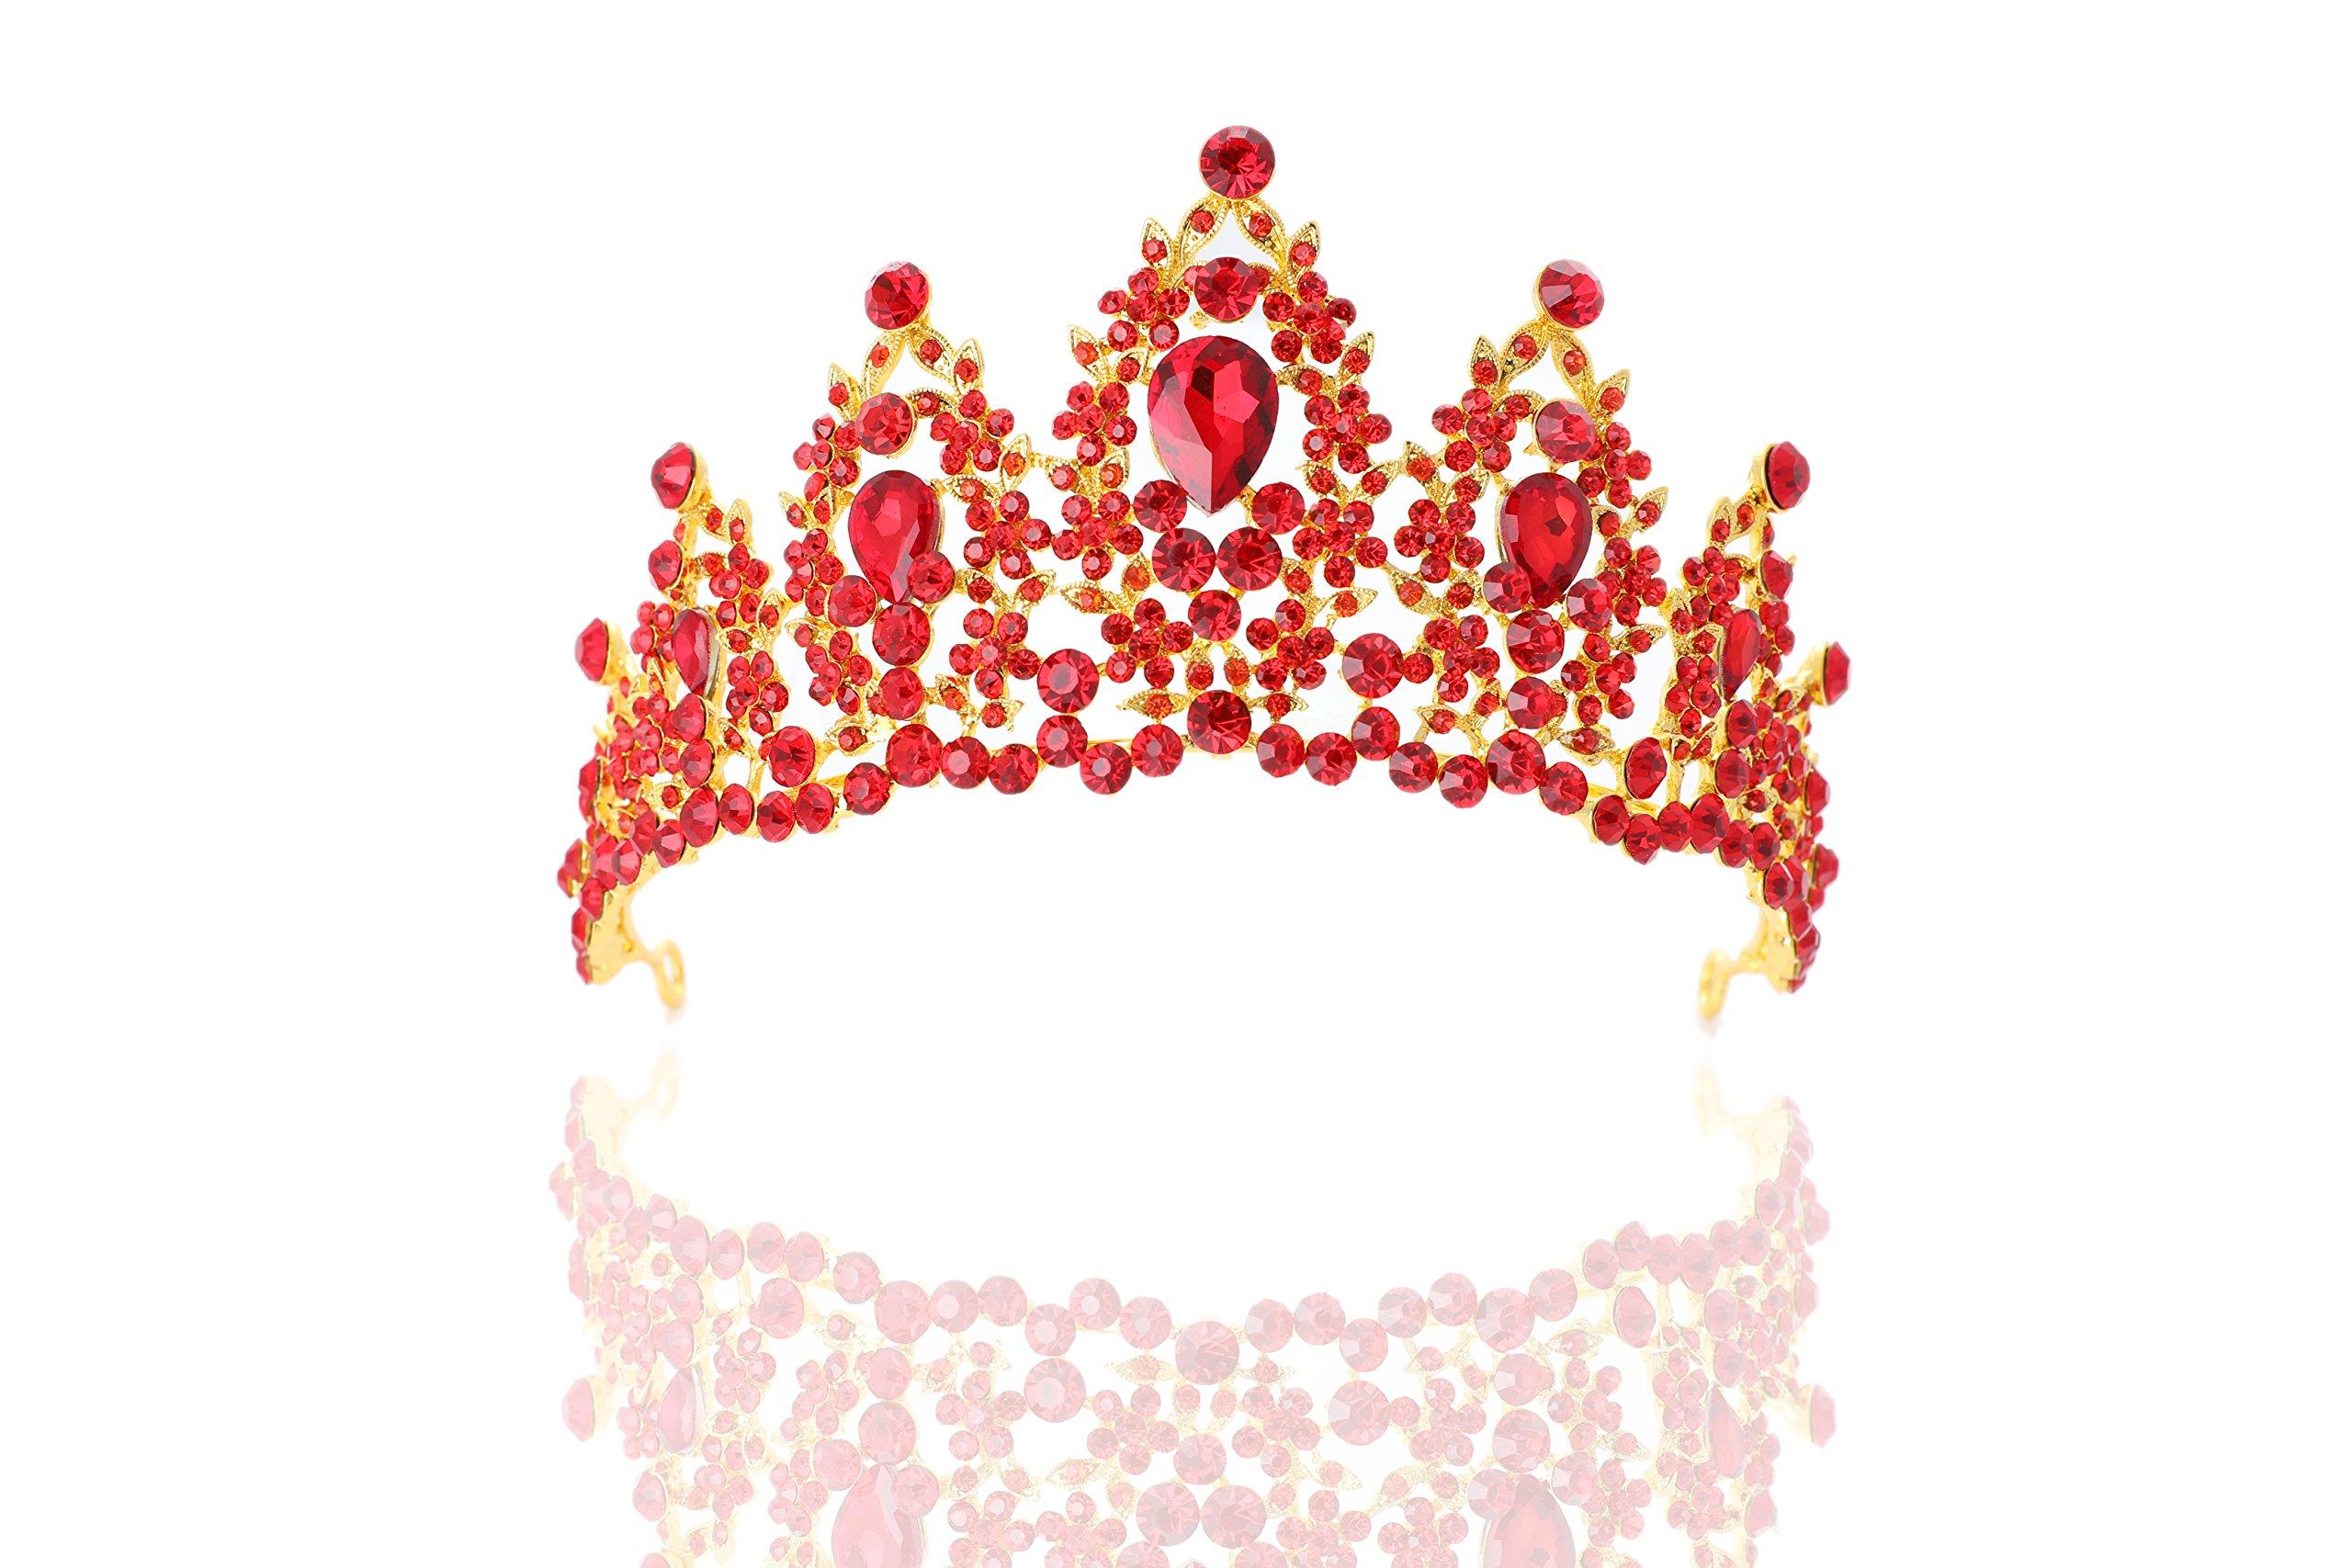 Chicer Baroque wedding Crown Tiara Queen Princess Vintage Rhinestone Tiara Accessories for Women and Girls(Red).